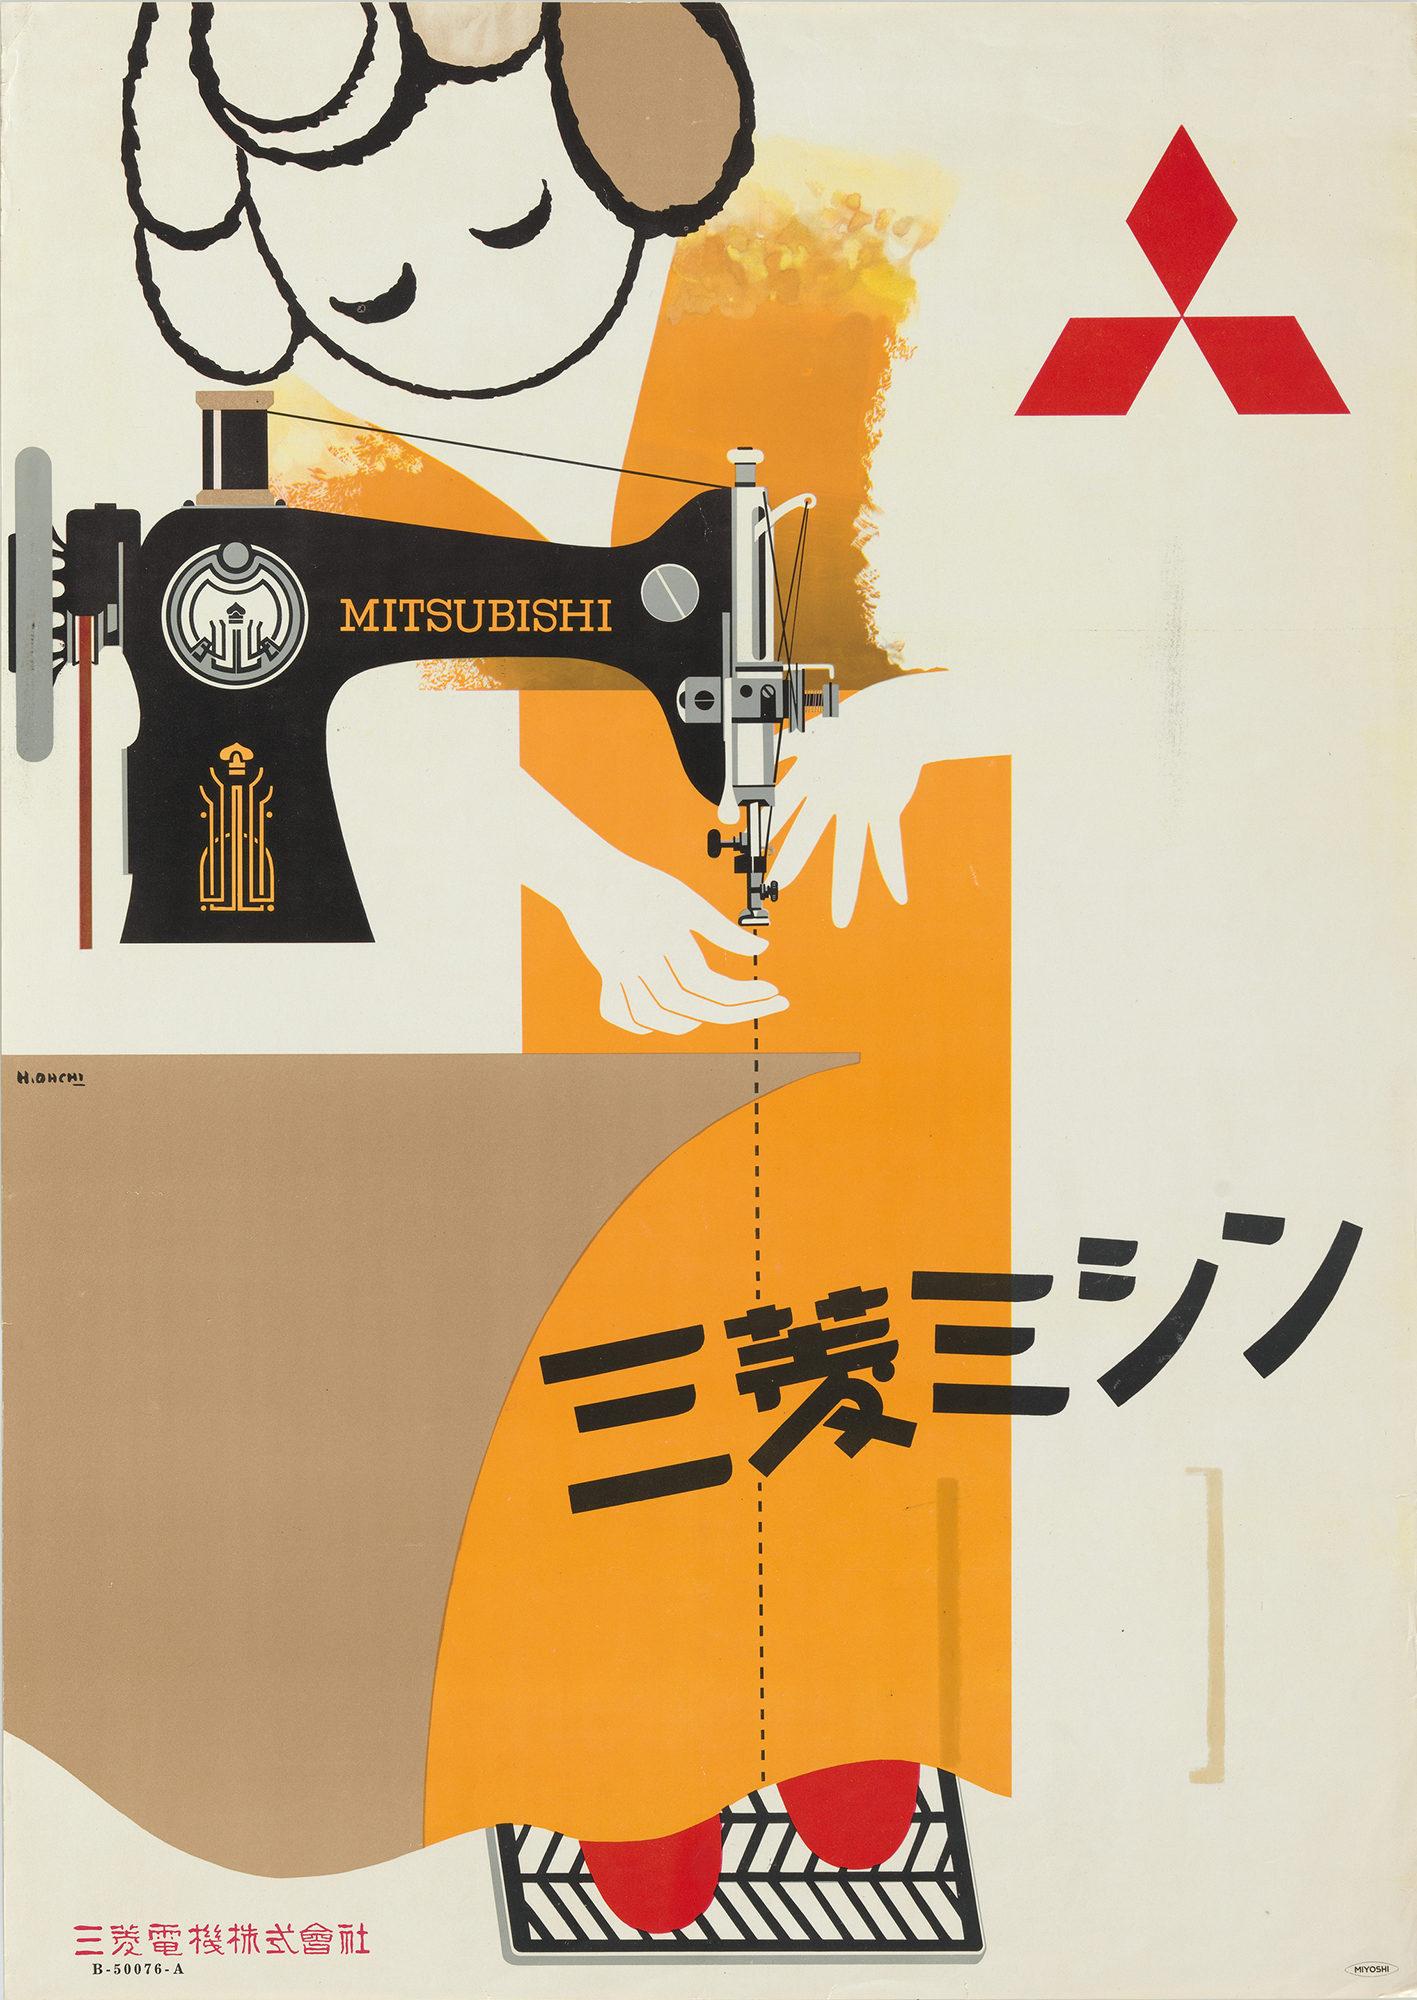 Mitsubishi Sewing Machine silkscreen by Hiroshi Ohchi